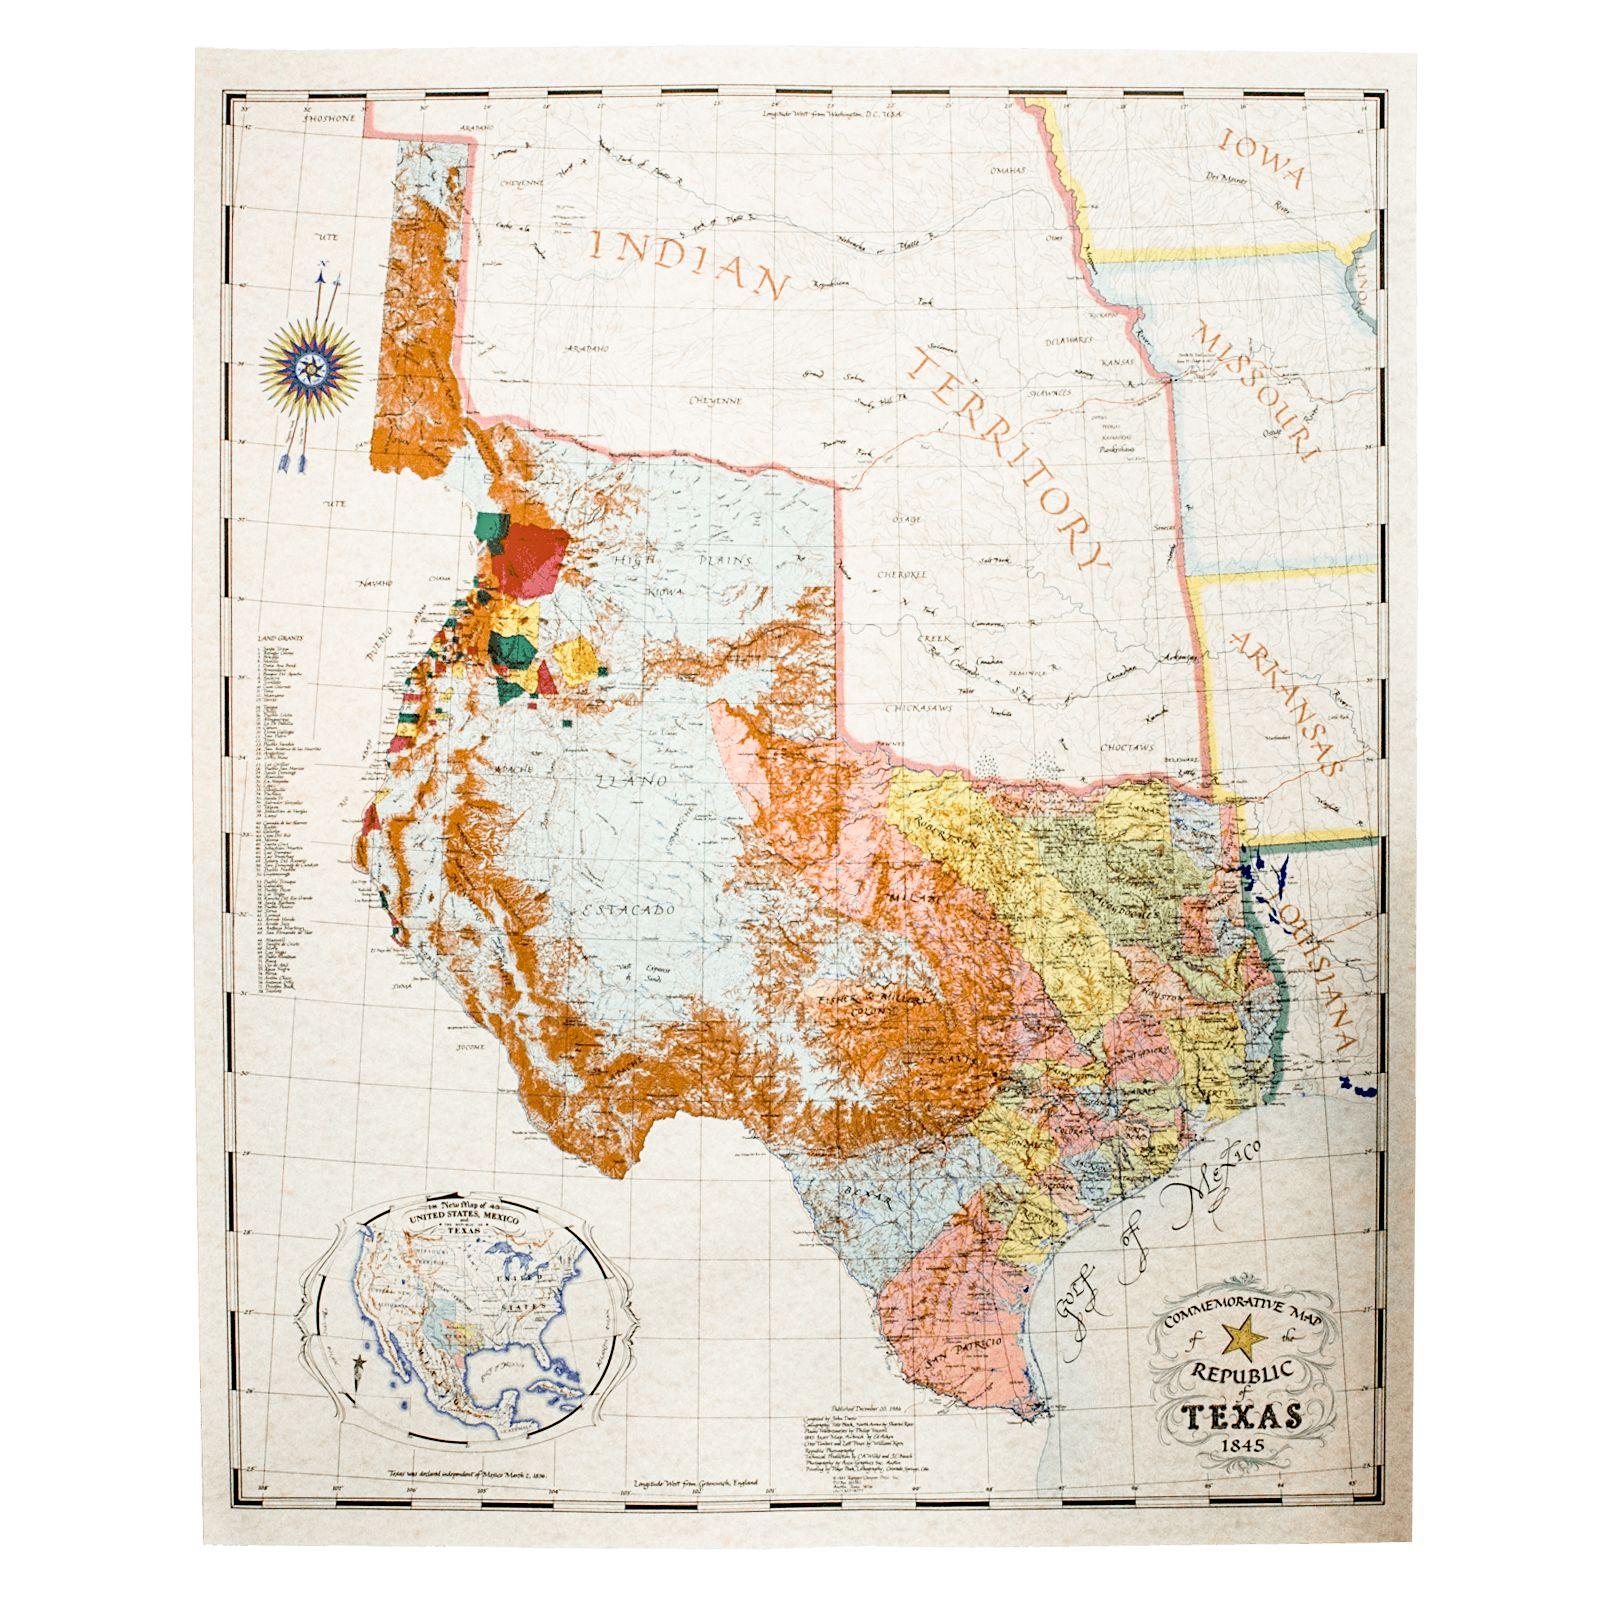 Texas Map 1845 | Smoothoperators - Republic Of Texas Map 1845